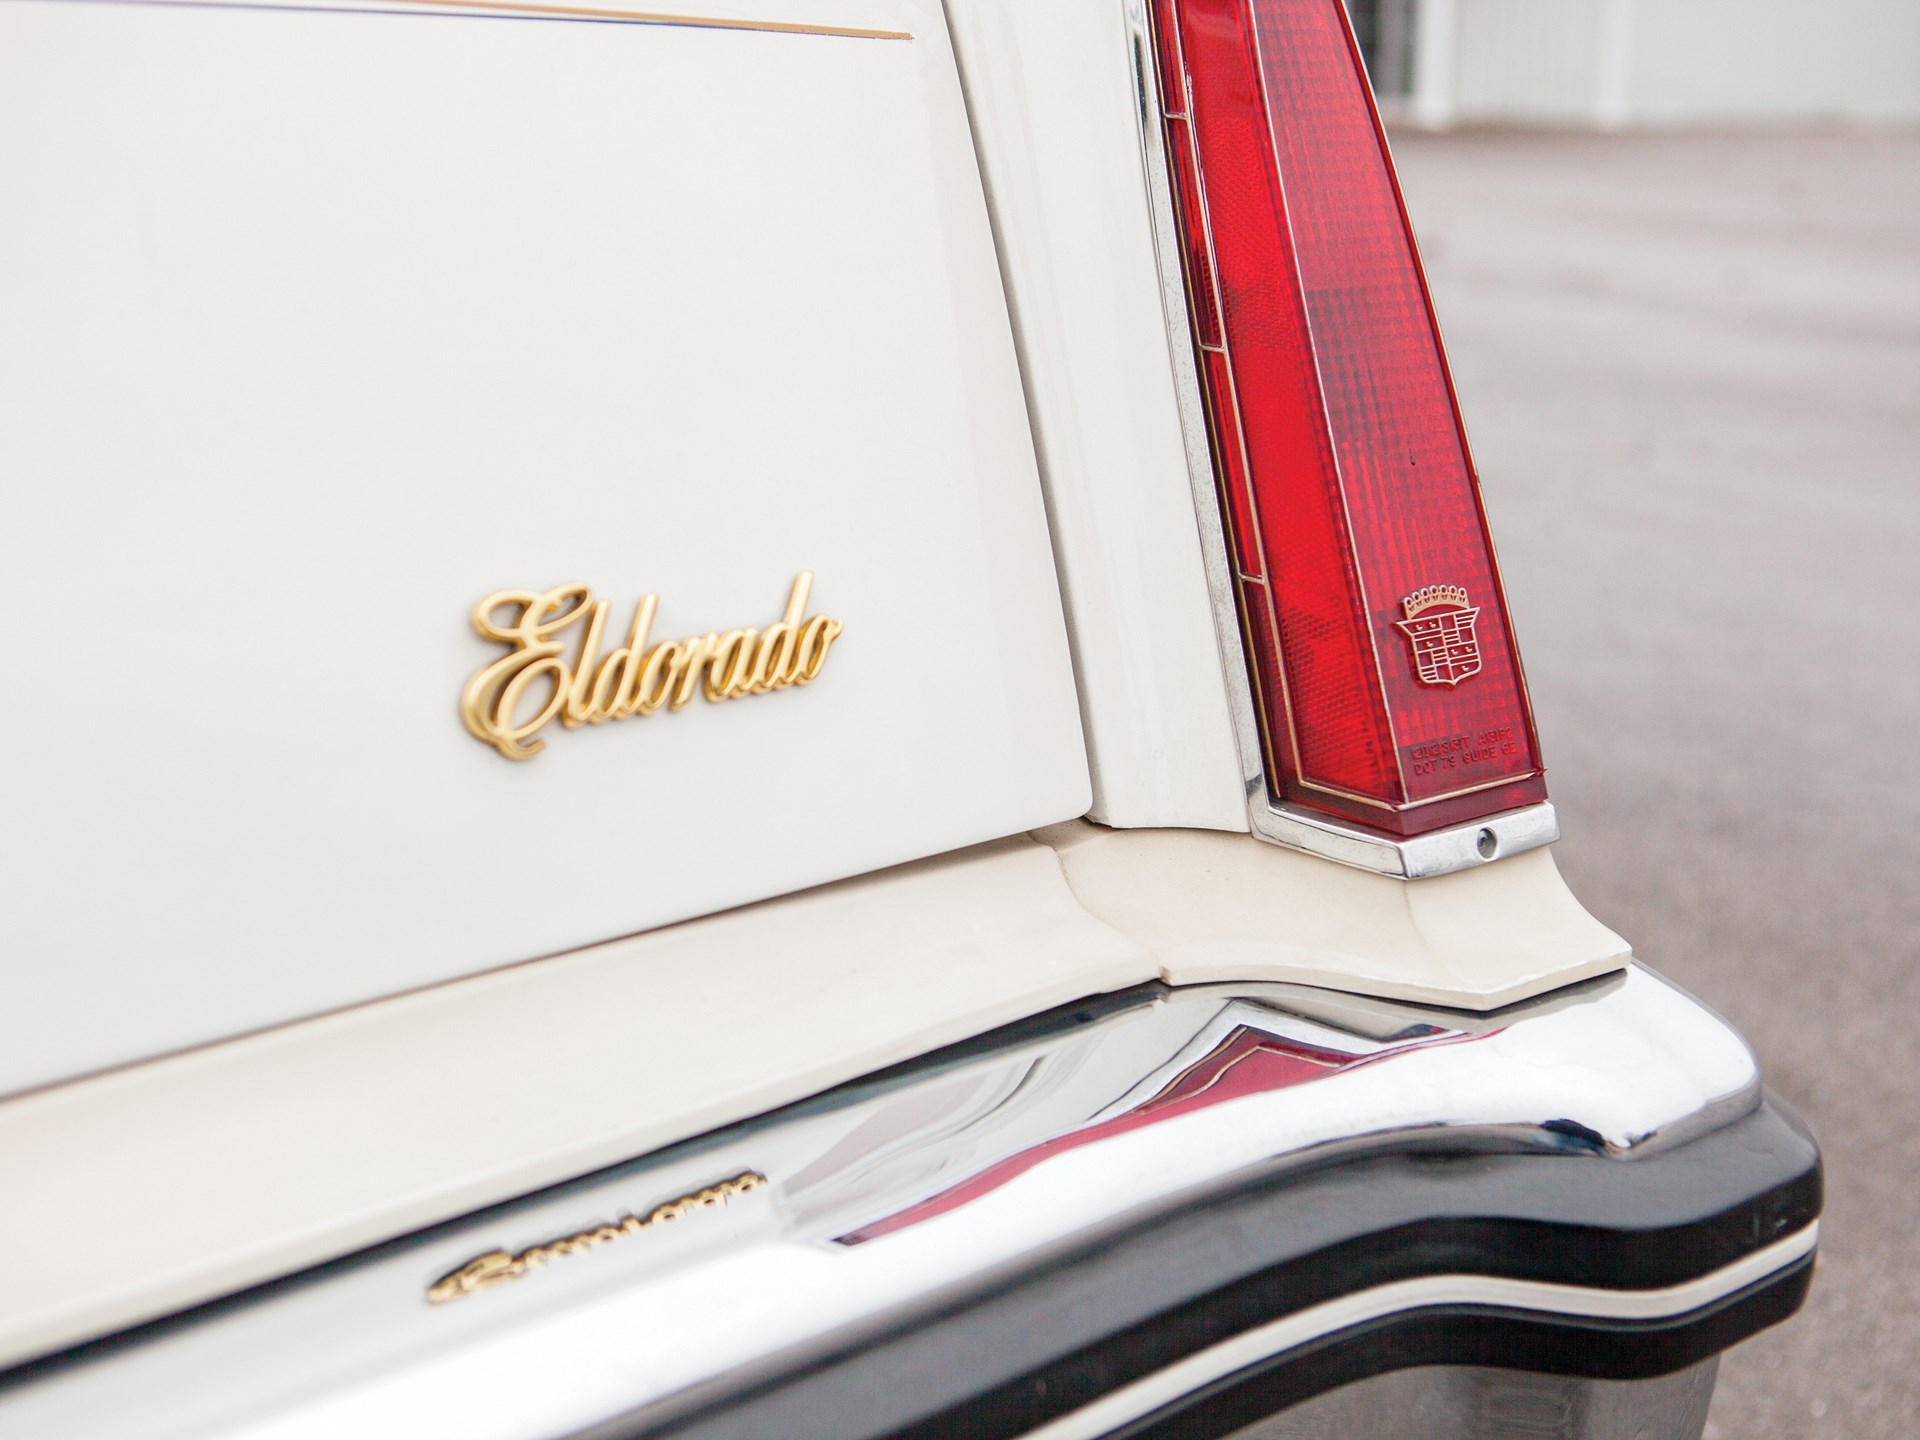 1985 Cadillac Eldorado Biarritz 'Commemorative'